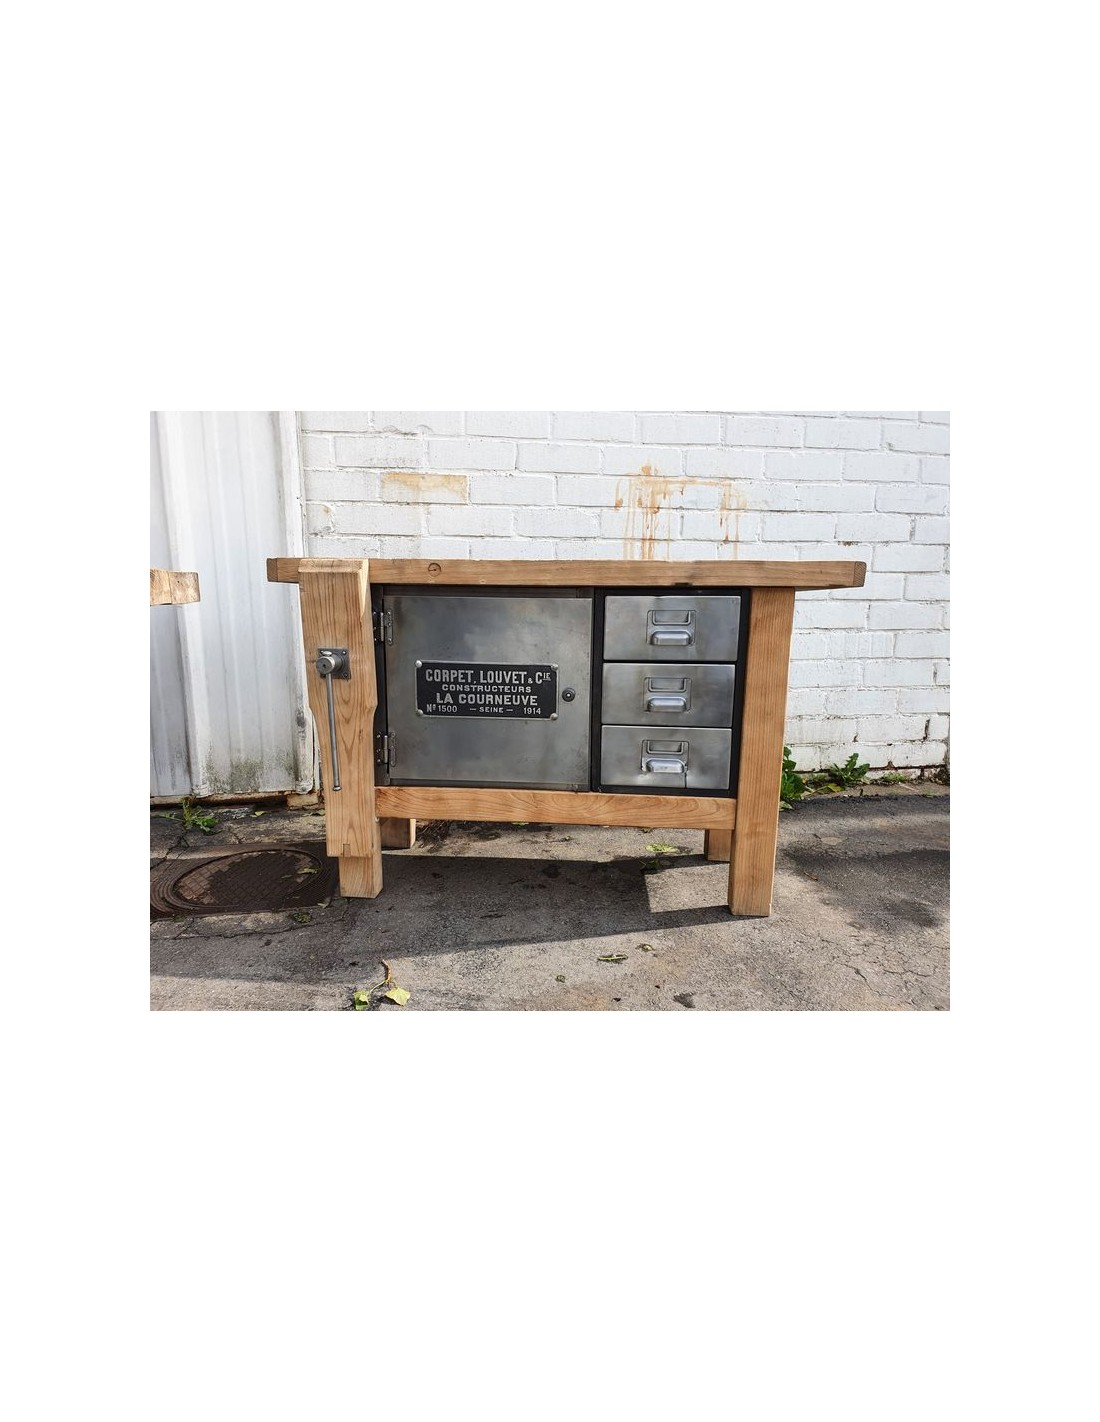 ancien etabli meuble industriel chene et metal